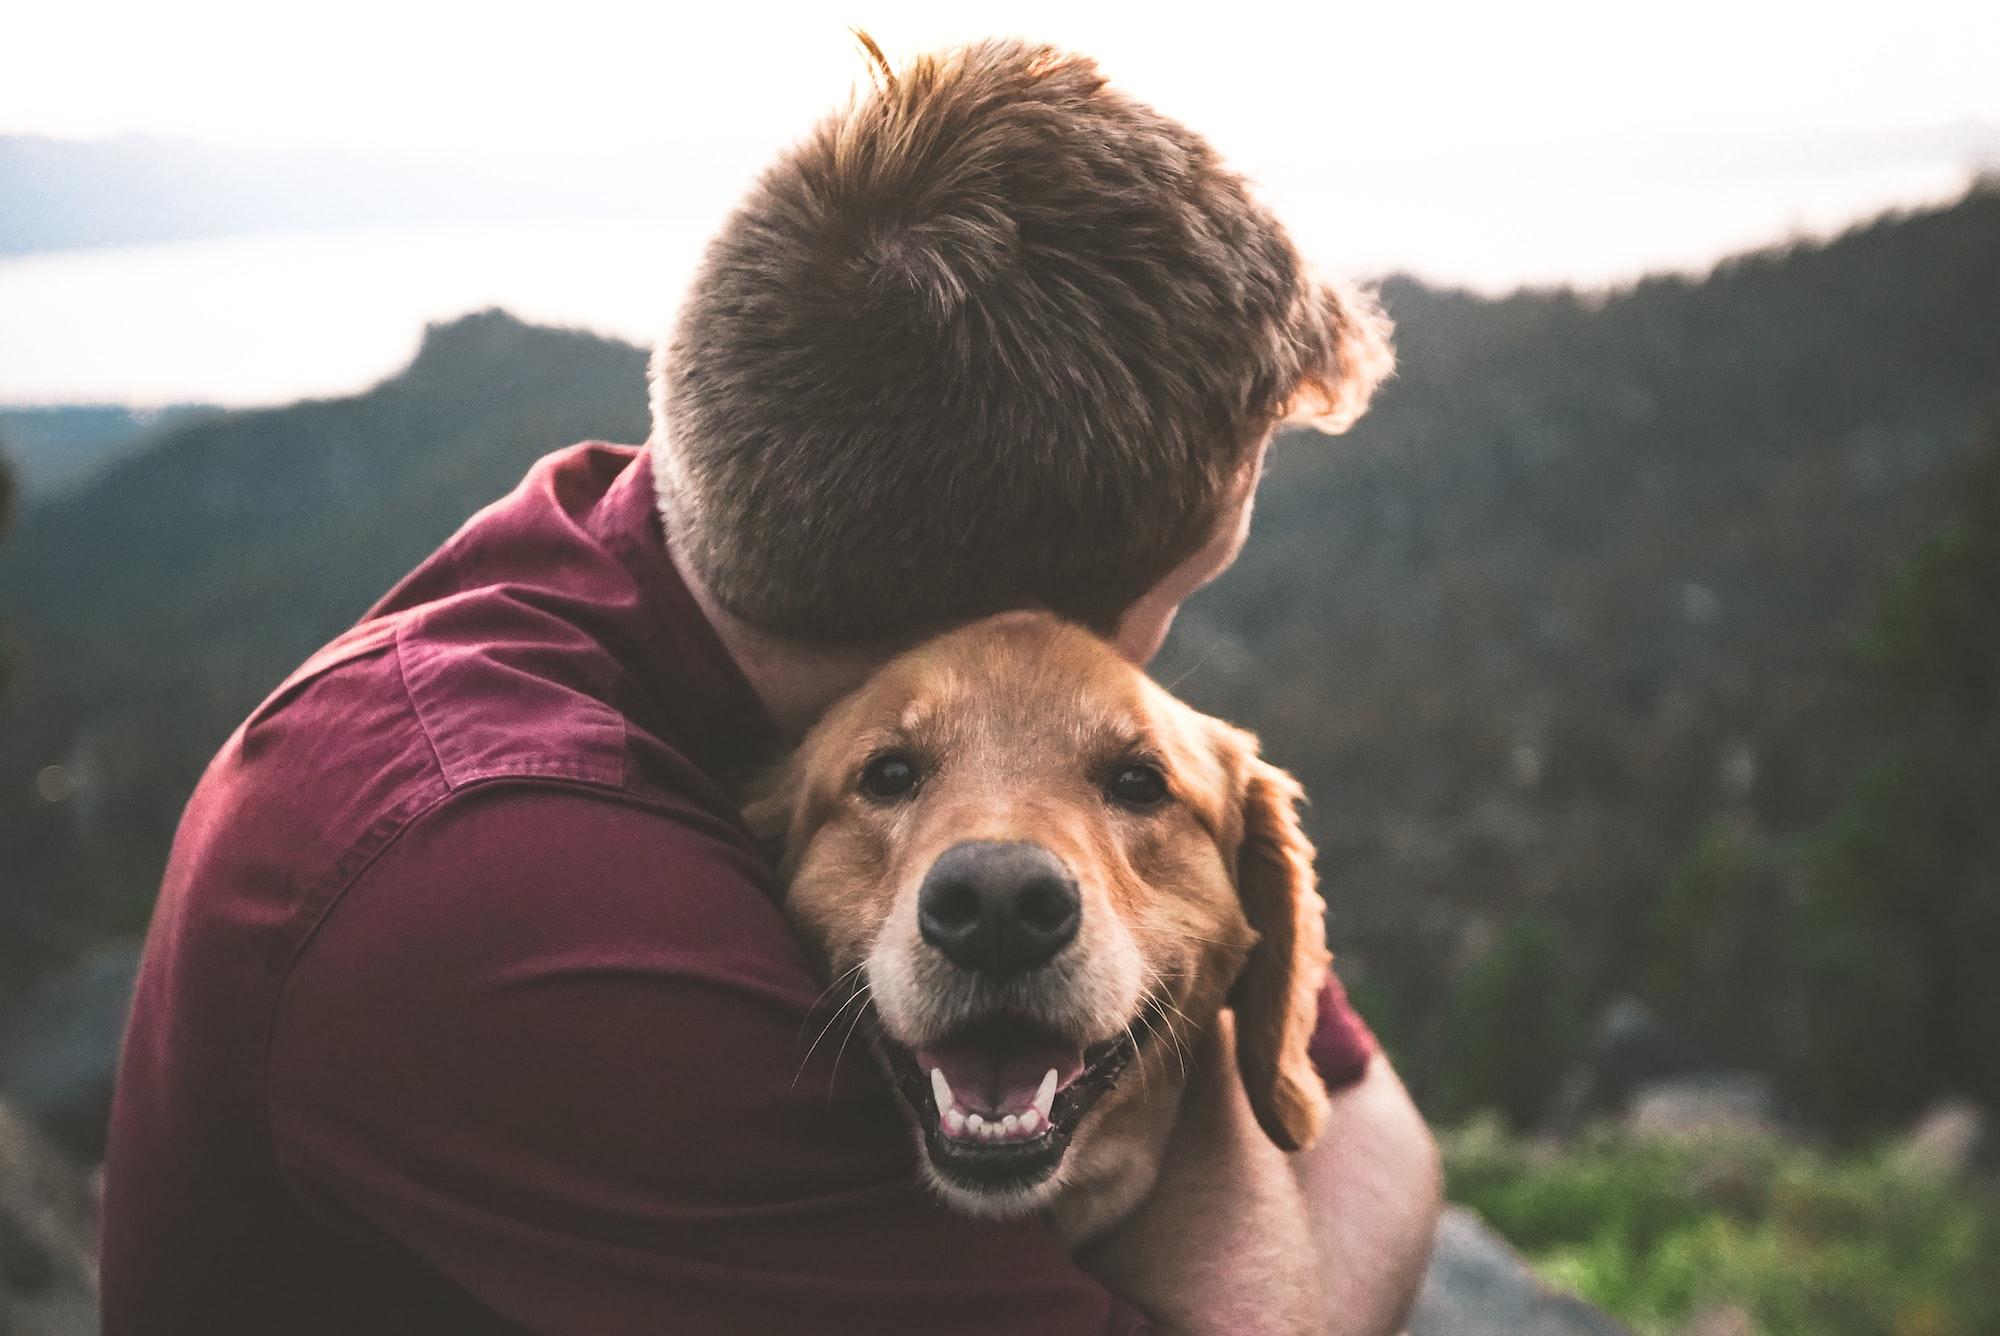 The Happy Doggo